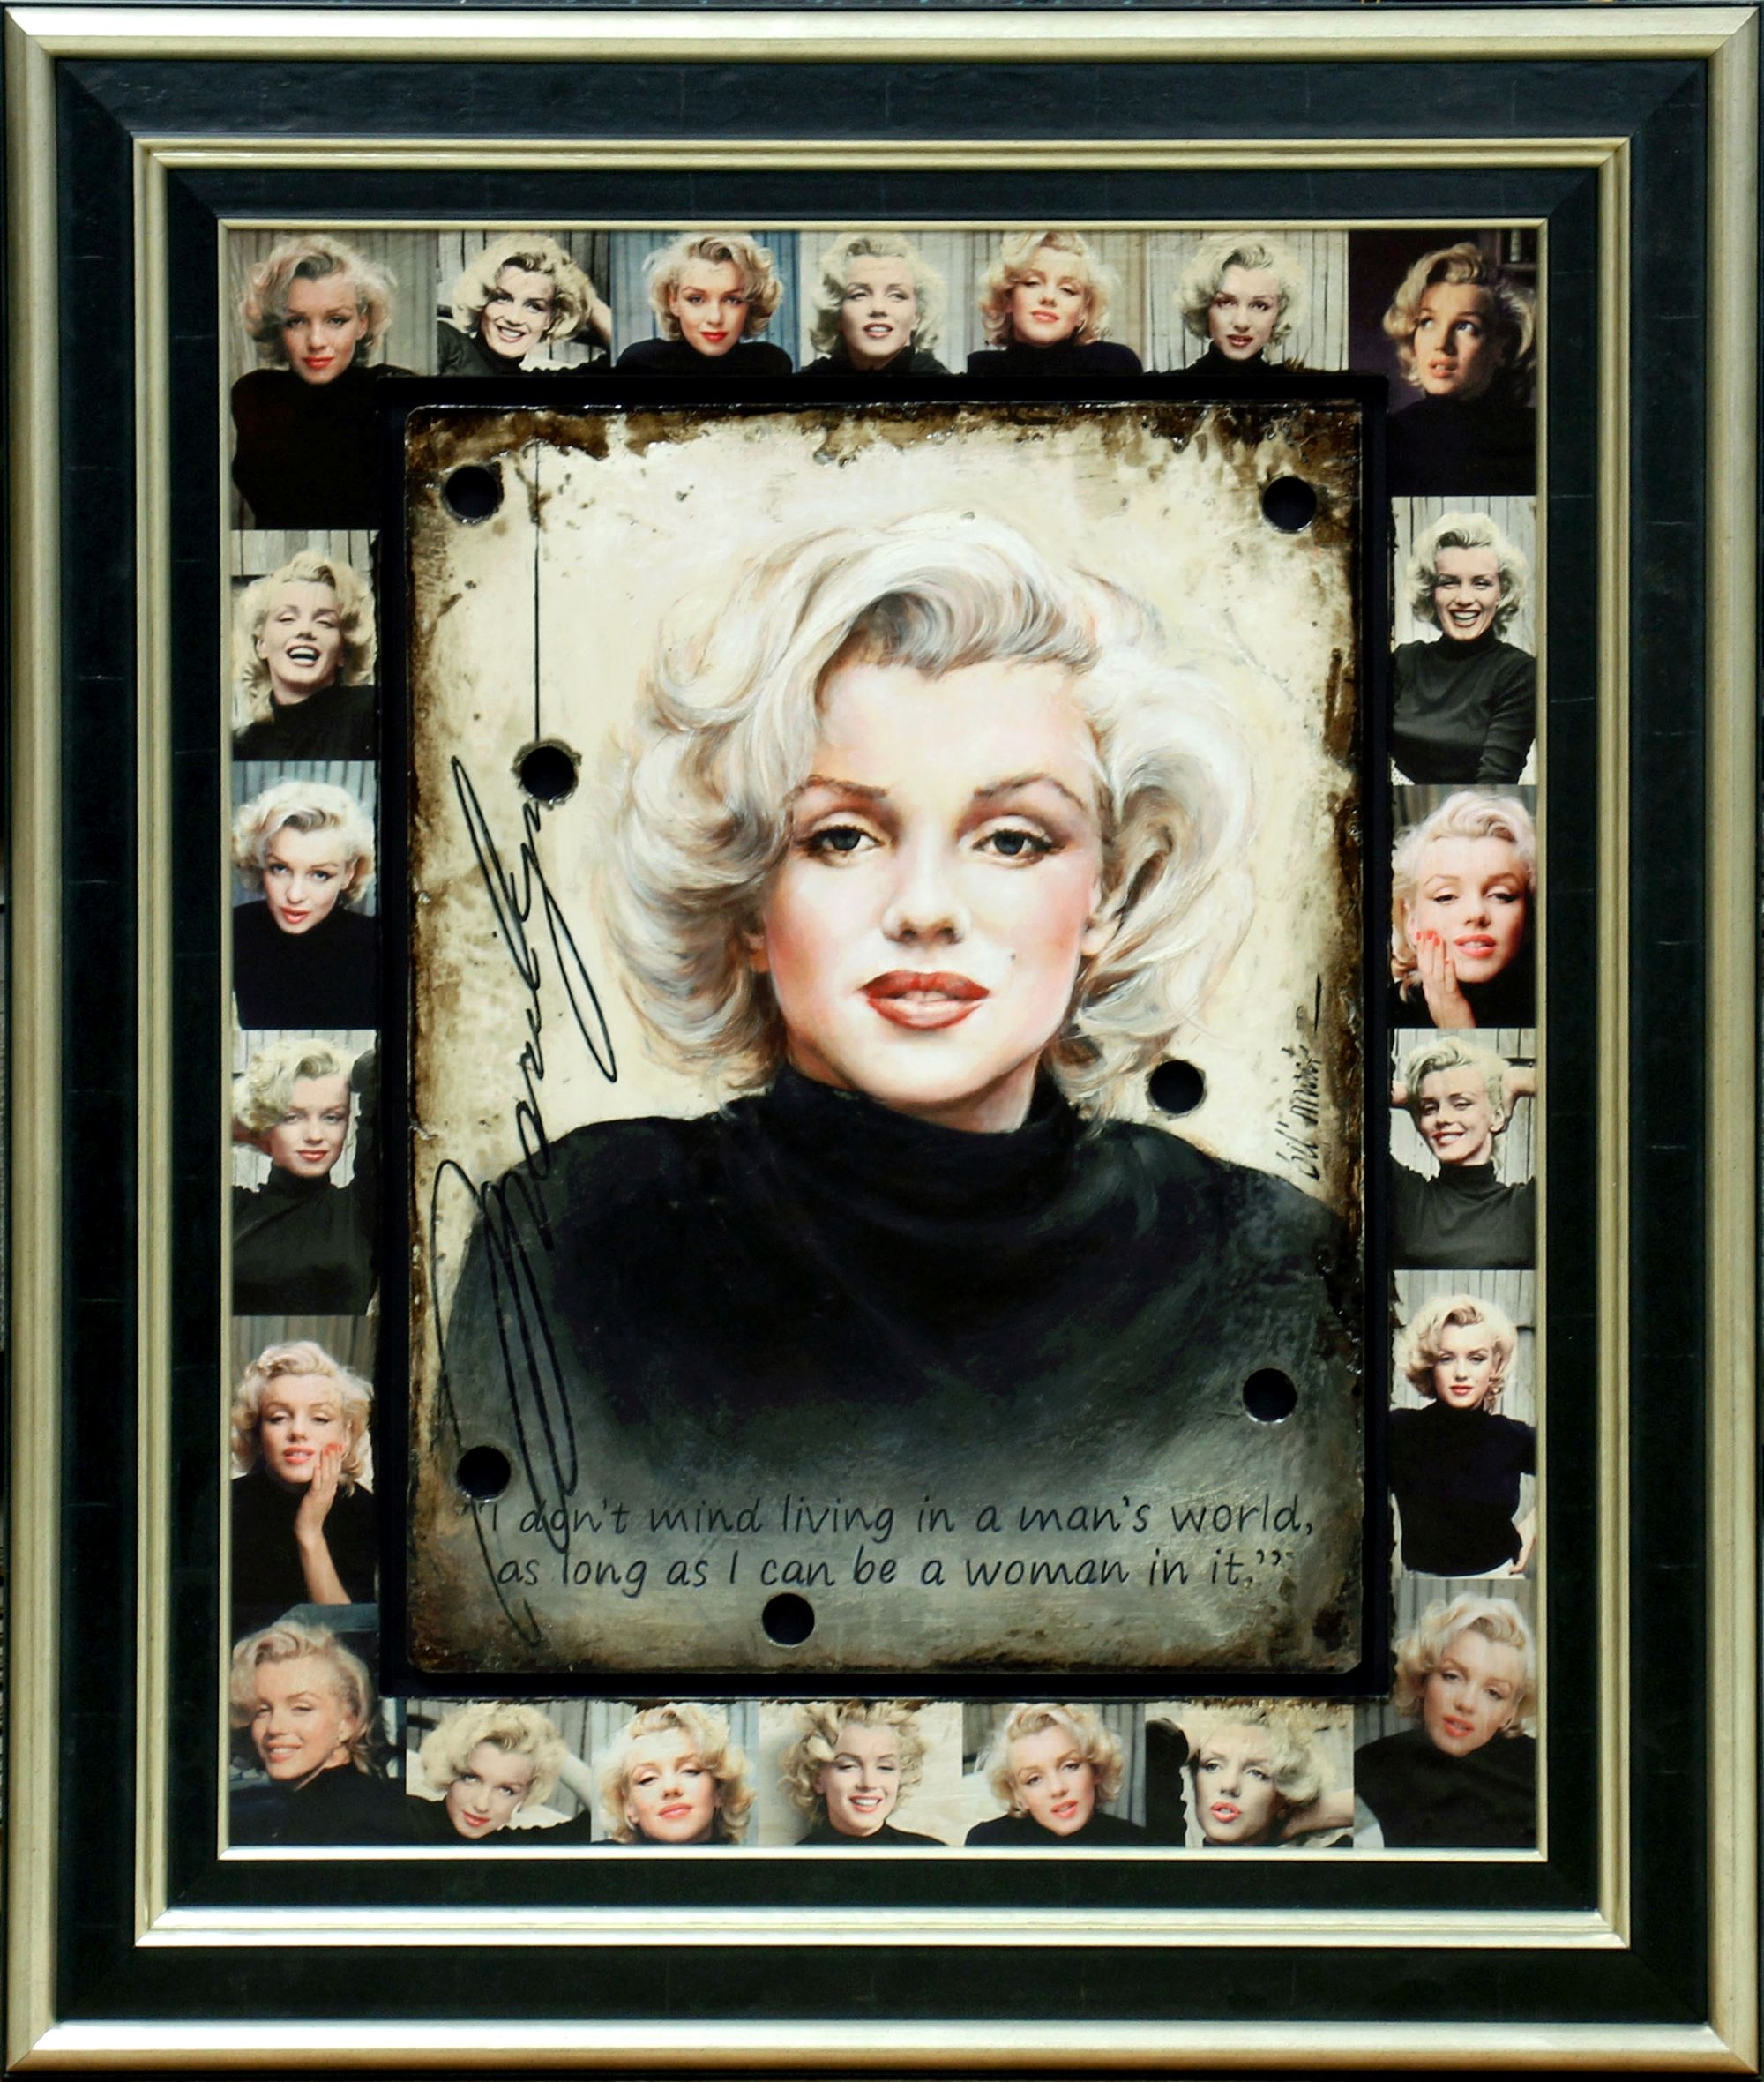 Marilyn Man's World by Bill Mack